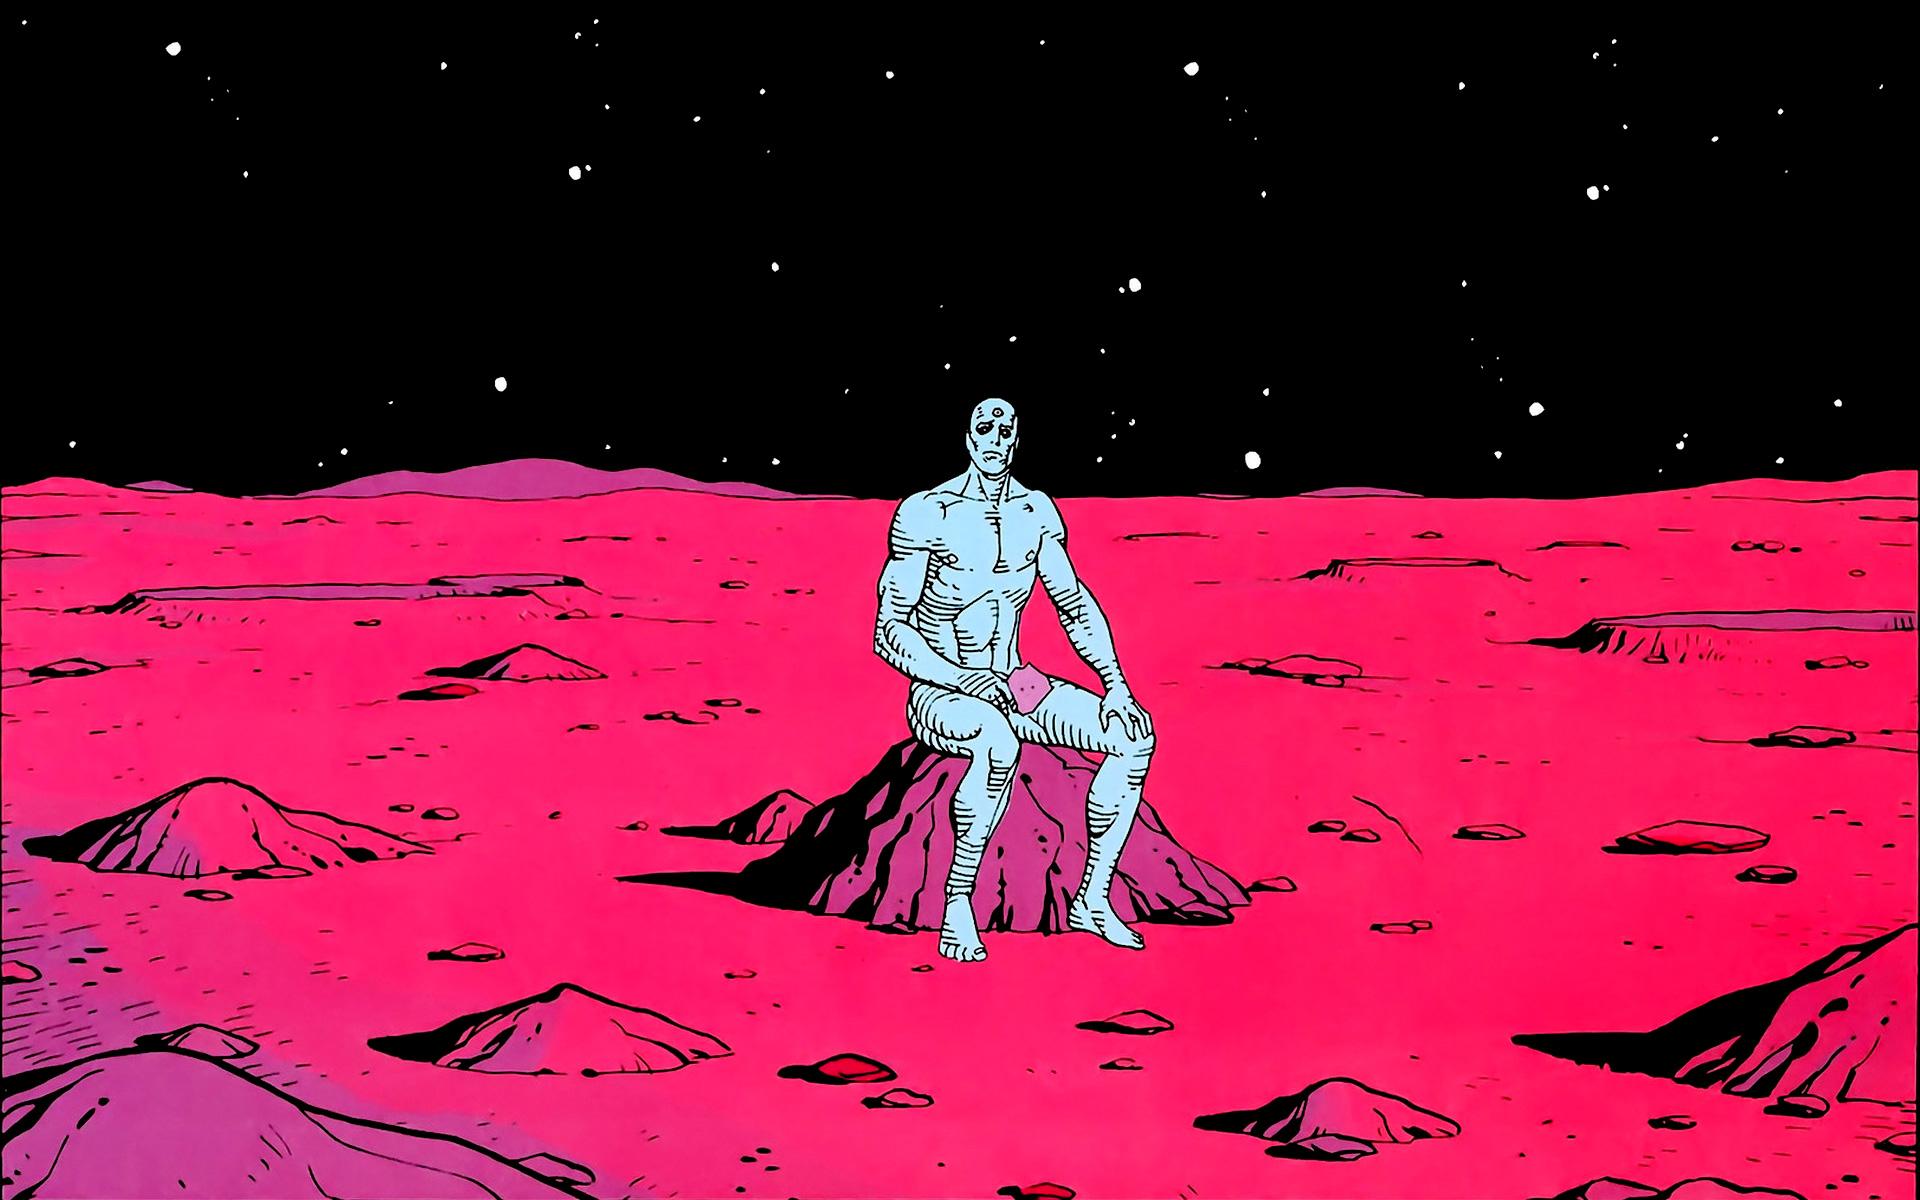 Drawing illustration red superhero alone silver surfer marvel geological phenomenon